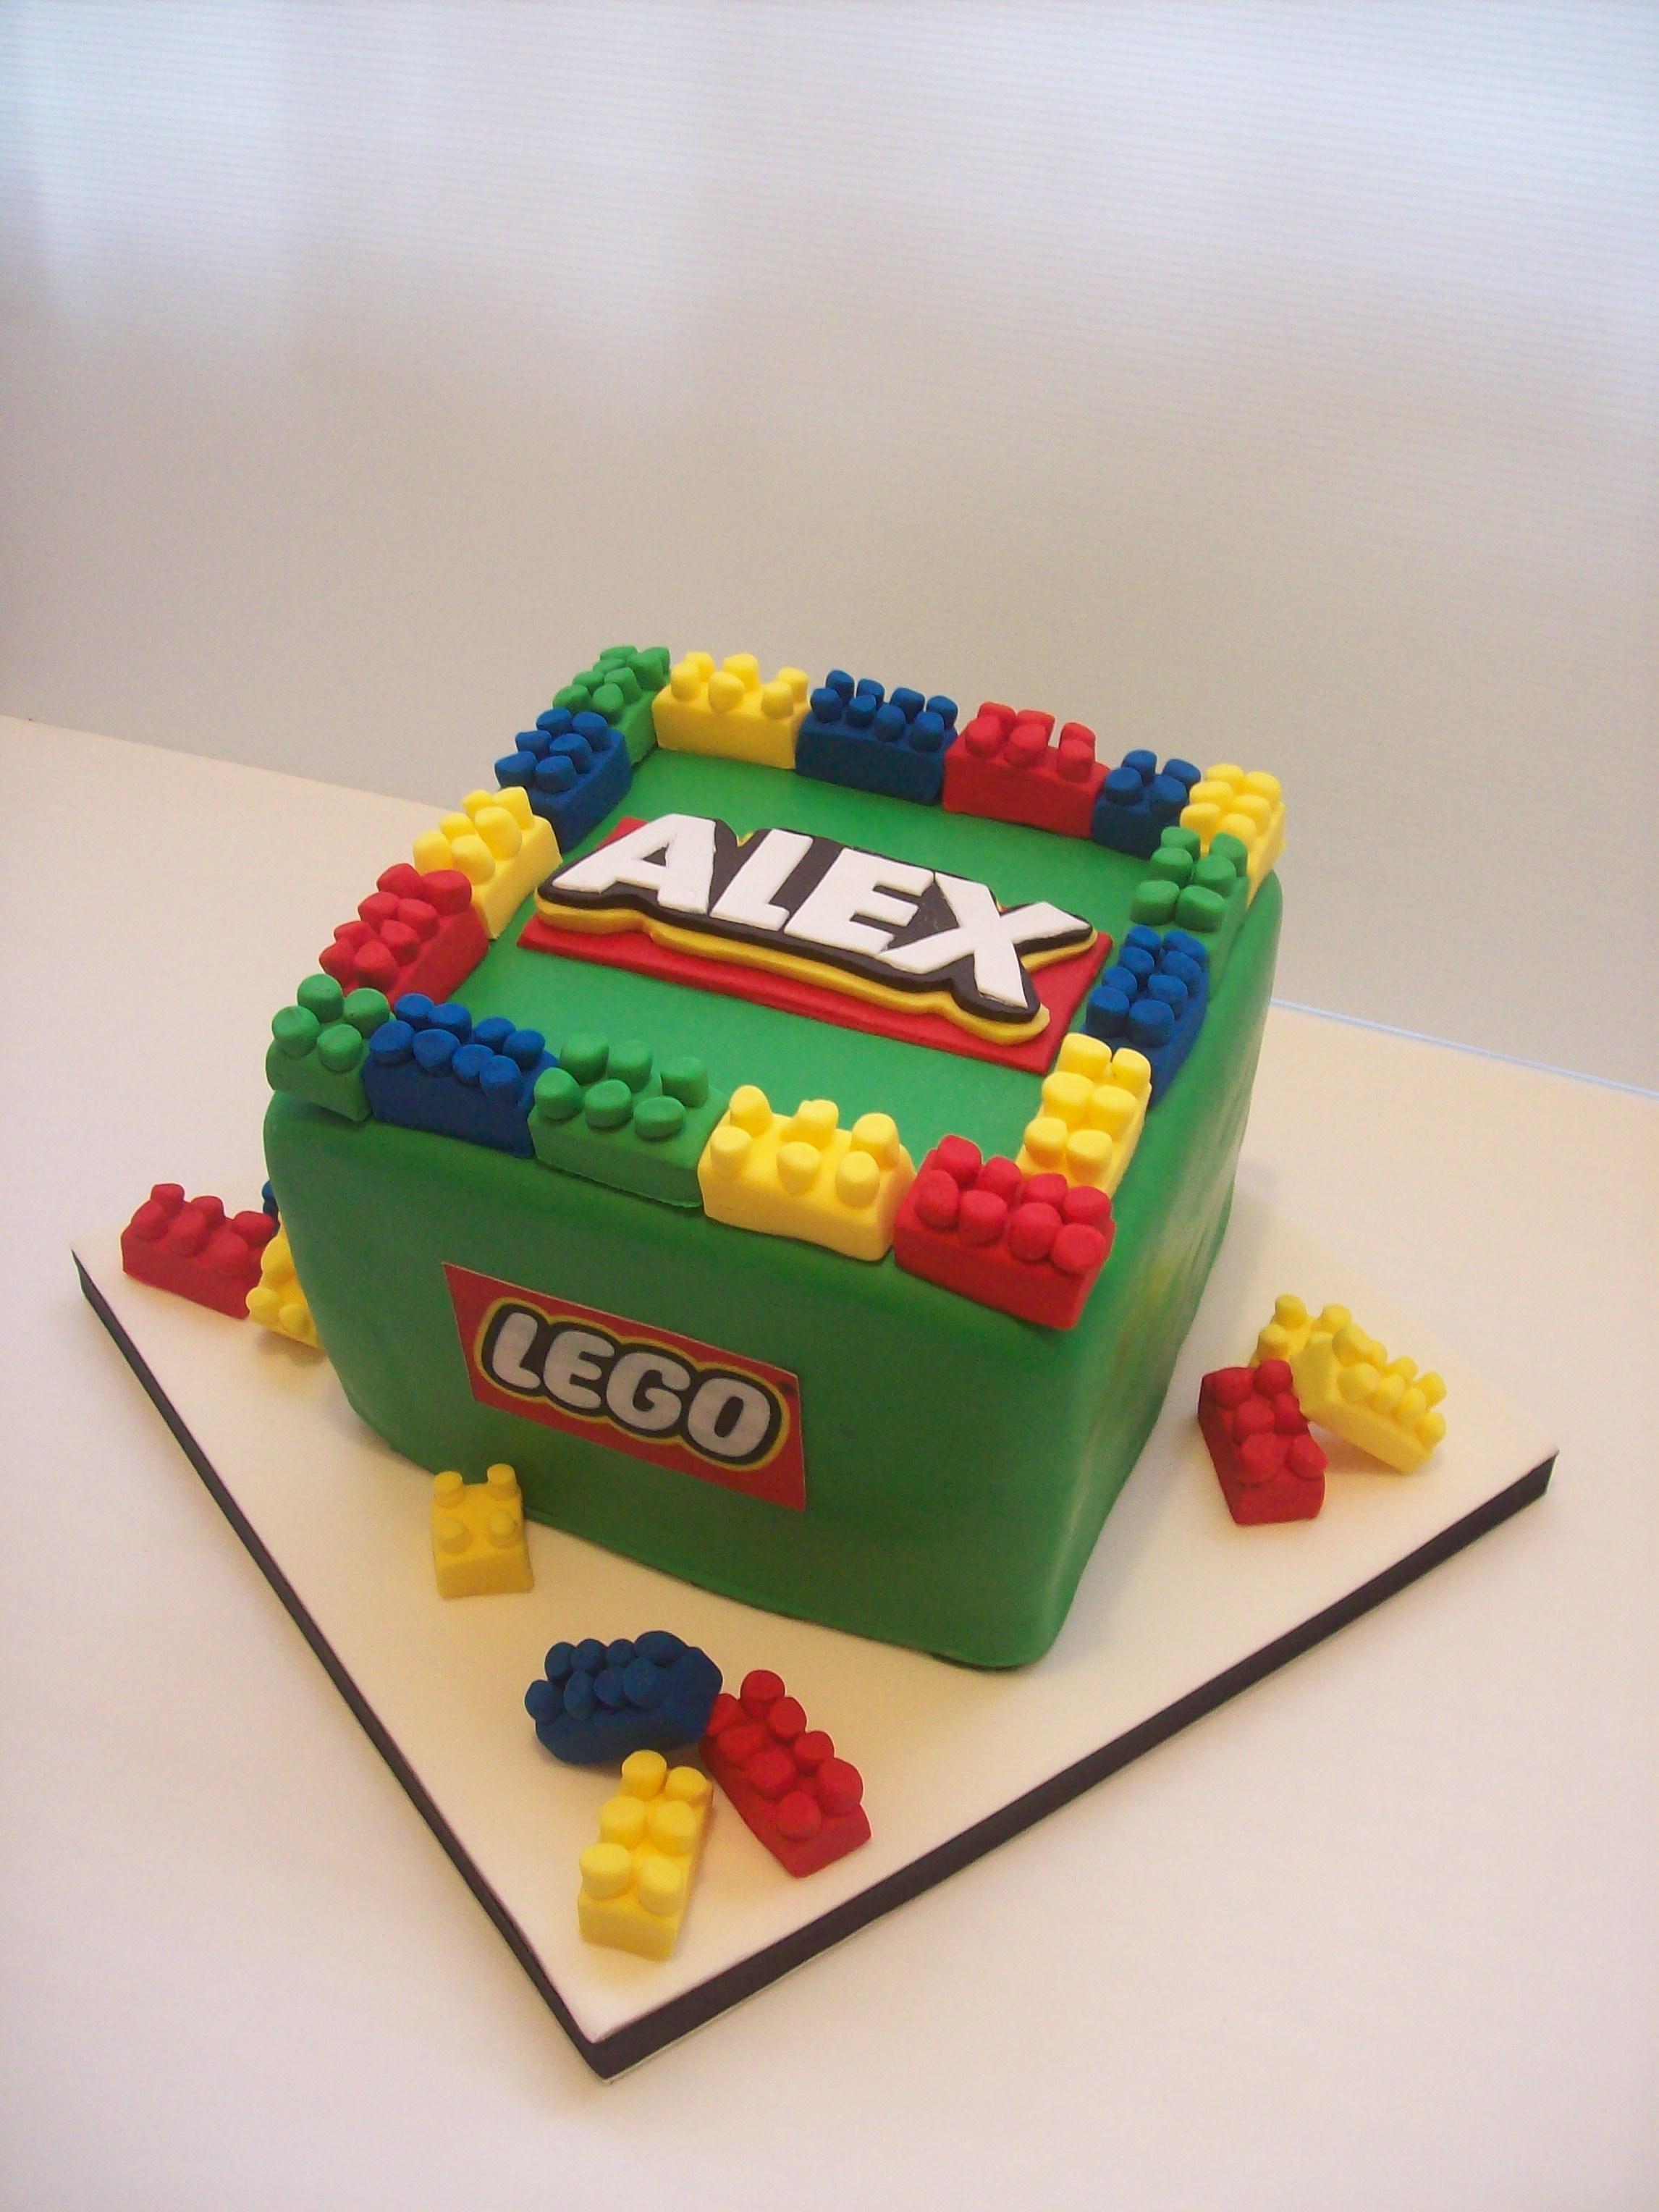 Lego Cube Cake 299 Temptation Cakes Temptation Cakes